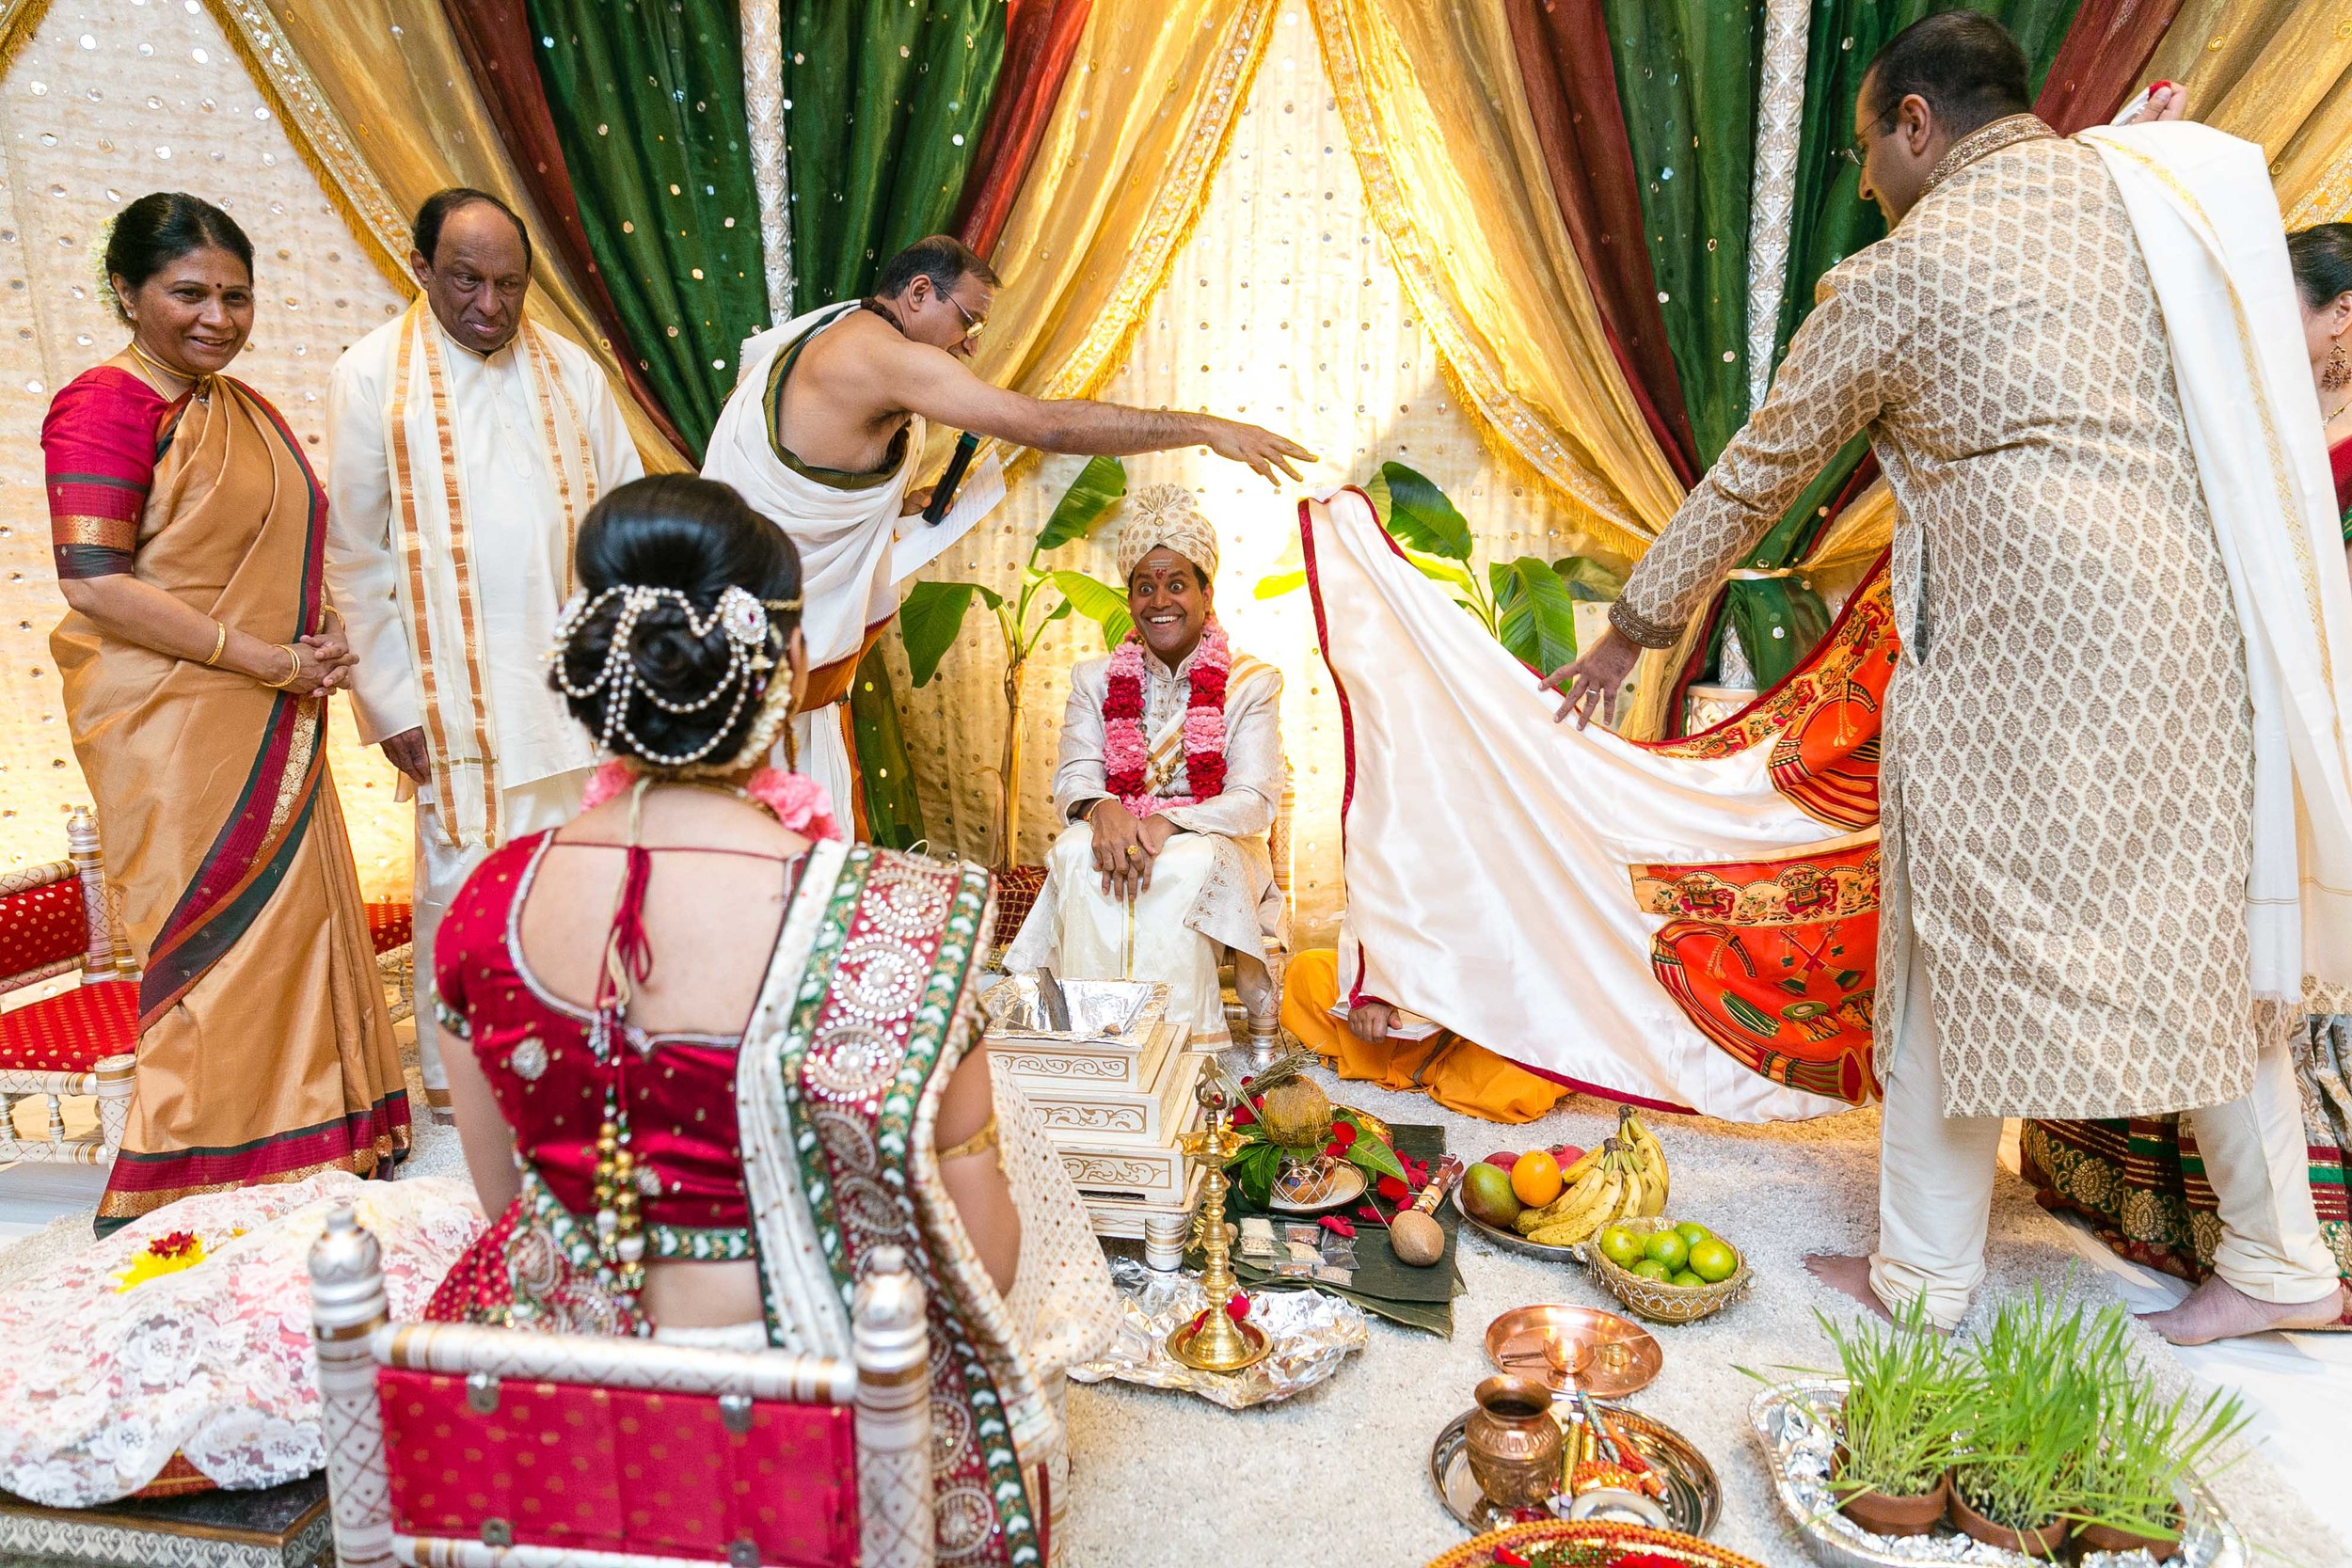 Luxurious-Indian-Wedding-Marriott-Boston-Massachusetts-Documentary-Wedding-Photography-by-Jacek-Dolata-20.jpg